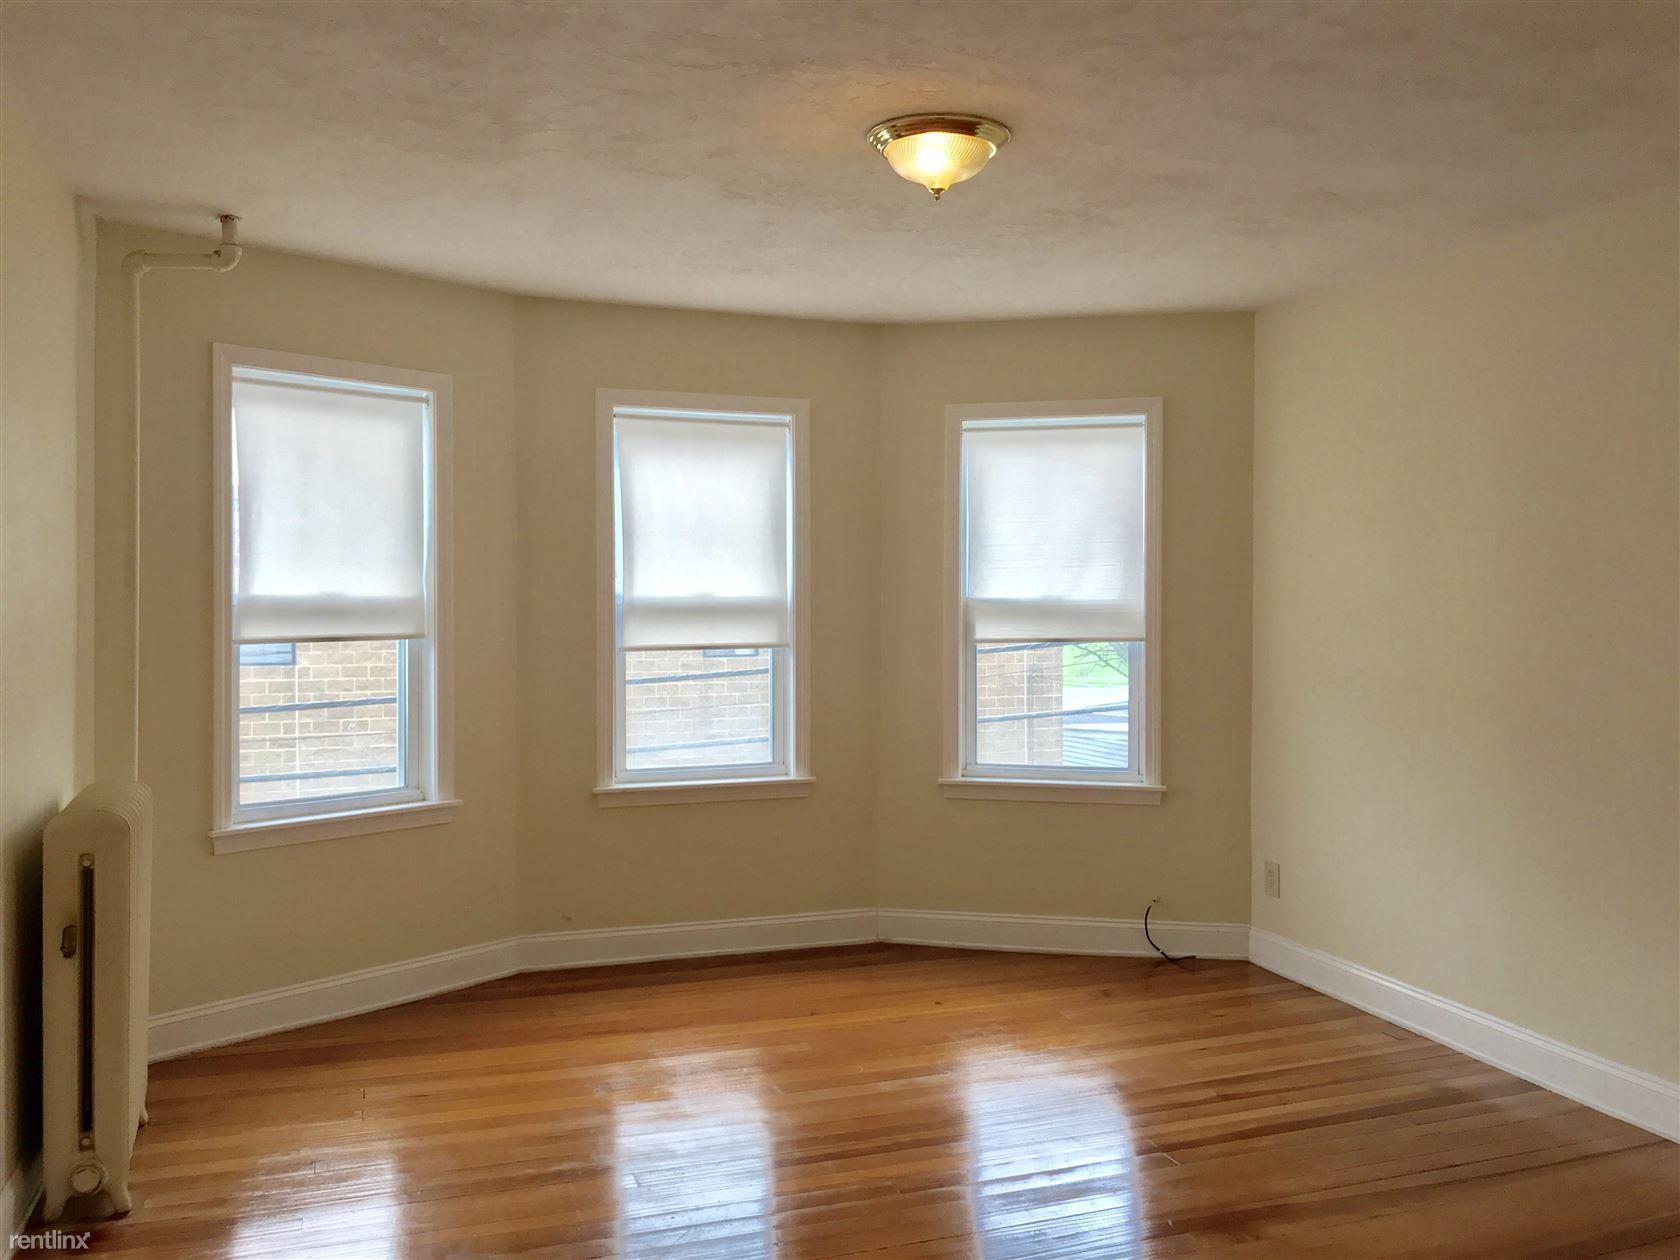 352 Shirley St, Winthrop, MA - $1,995